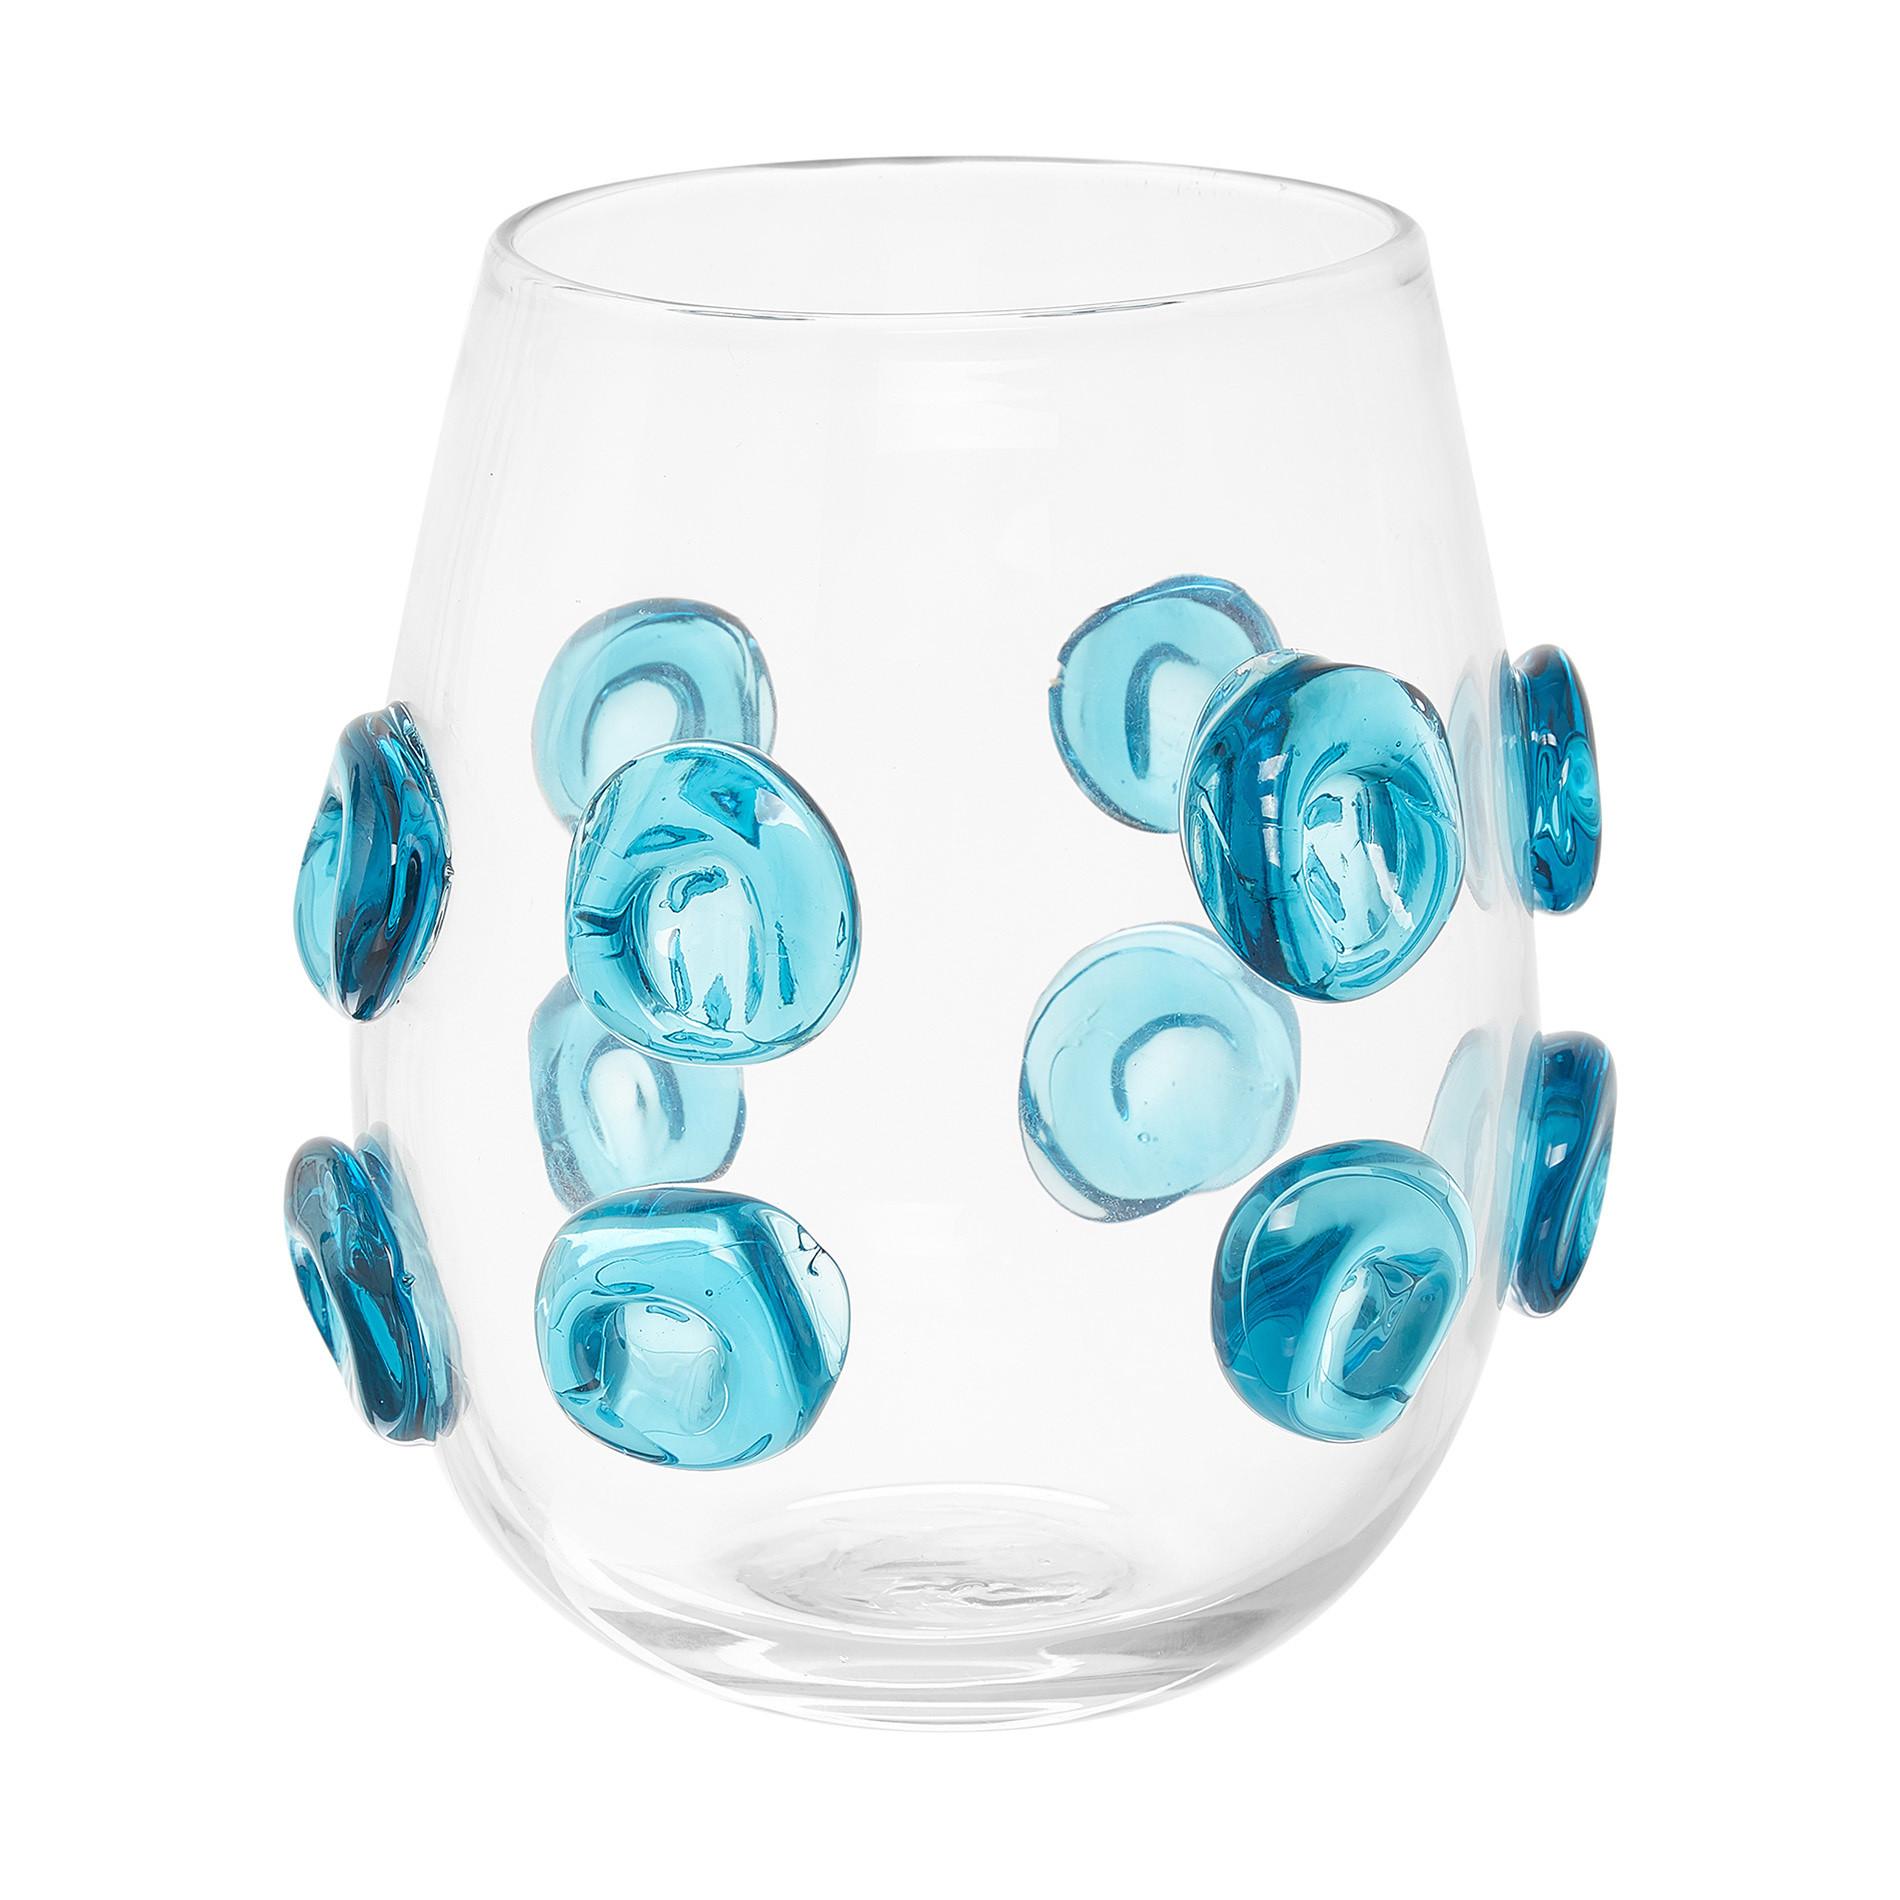 Vaso vetro colorato in pasta, Trasparente, large image number 0